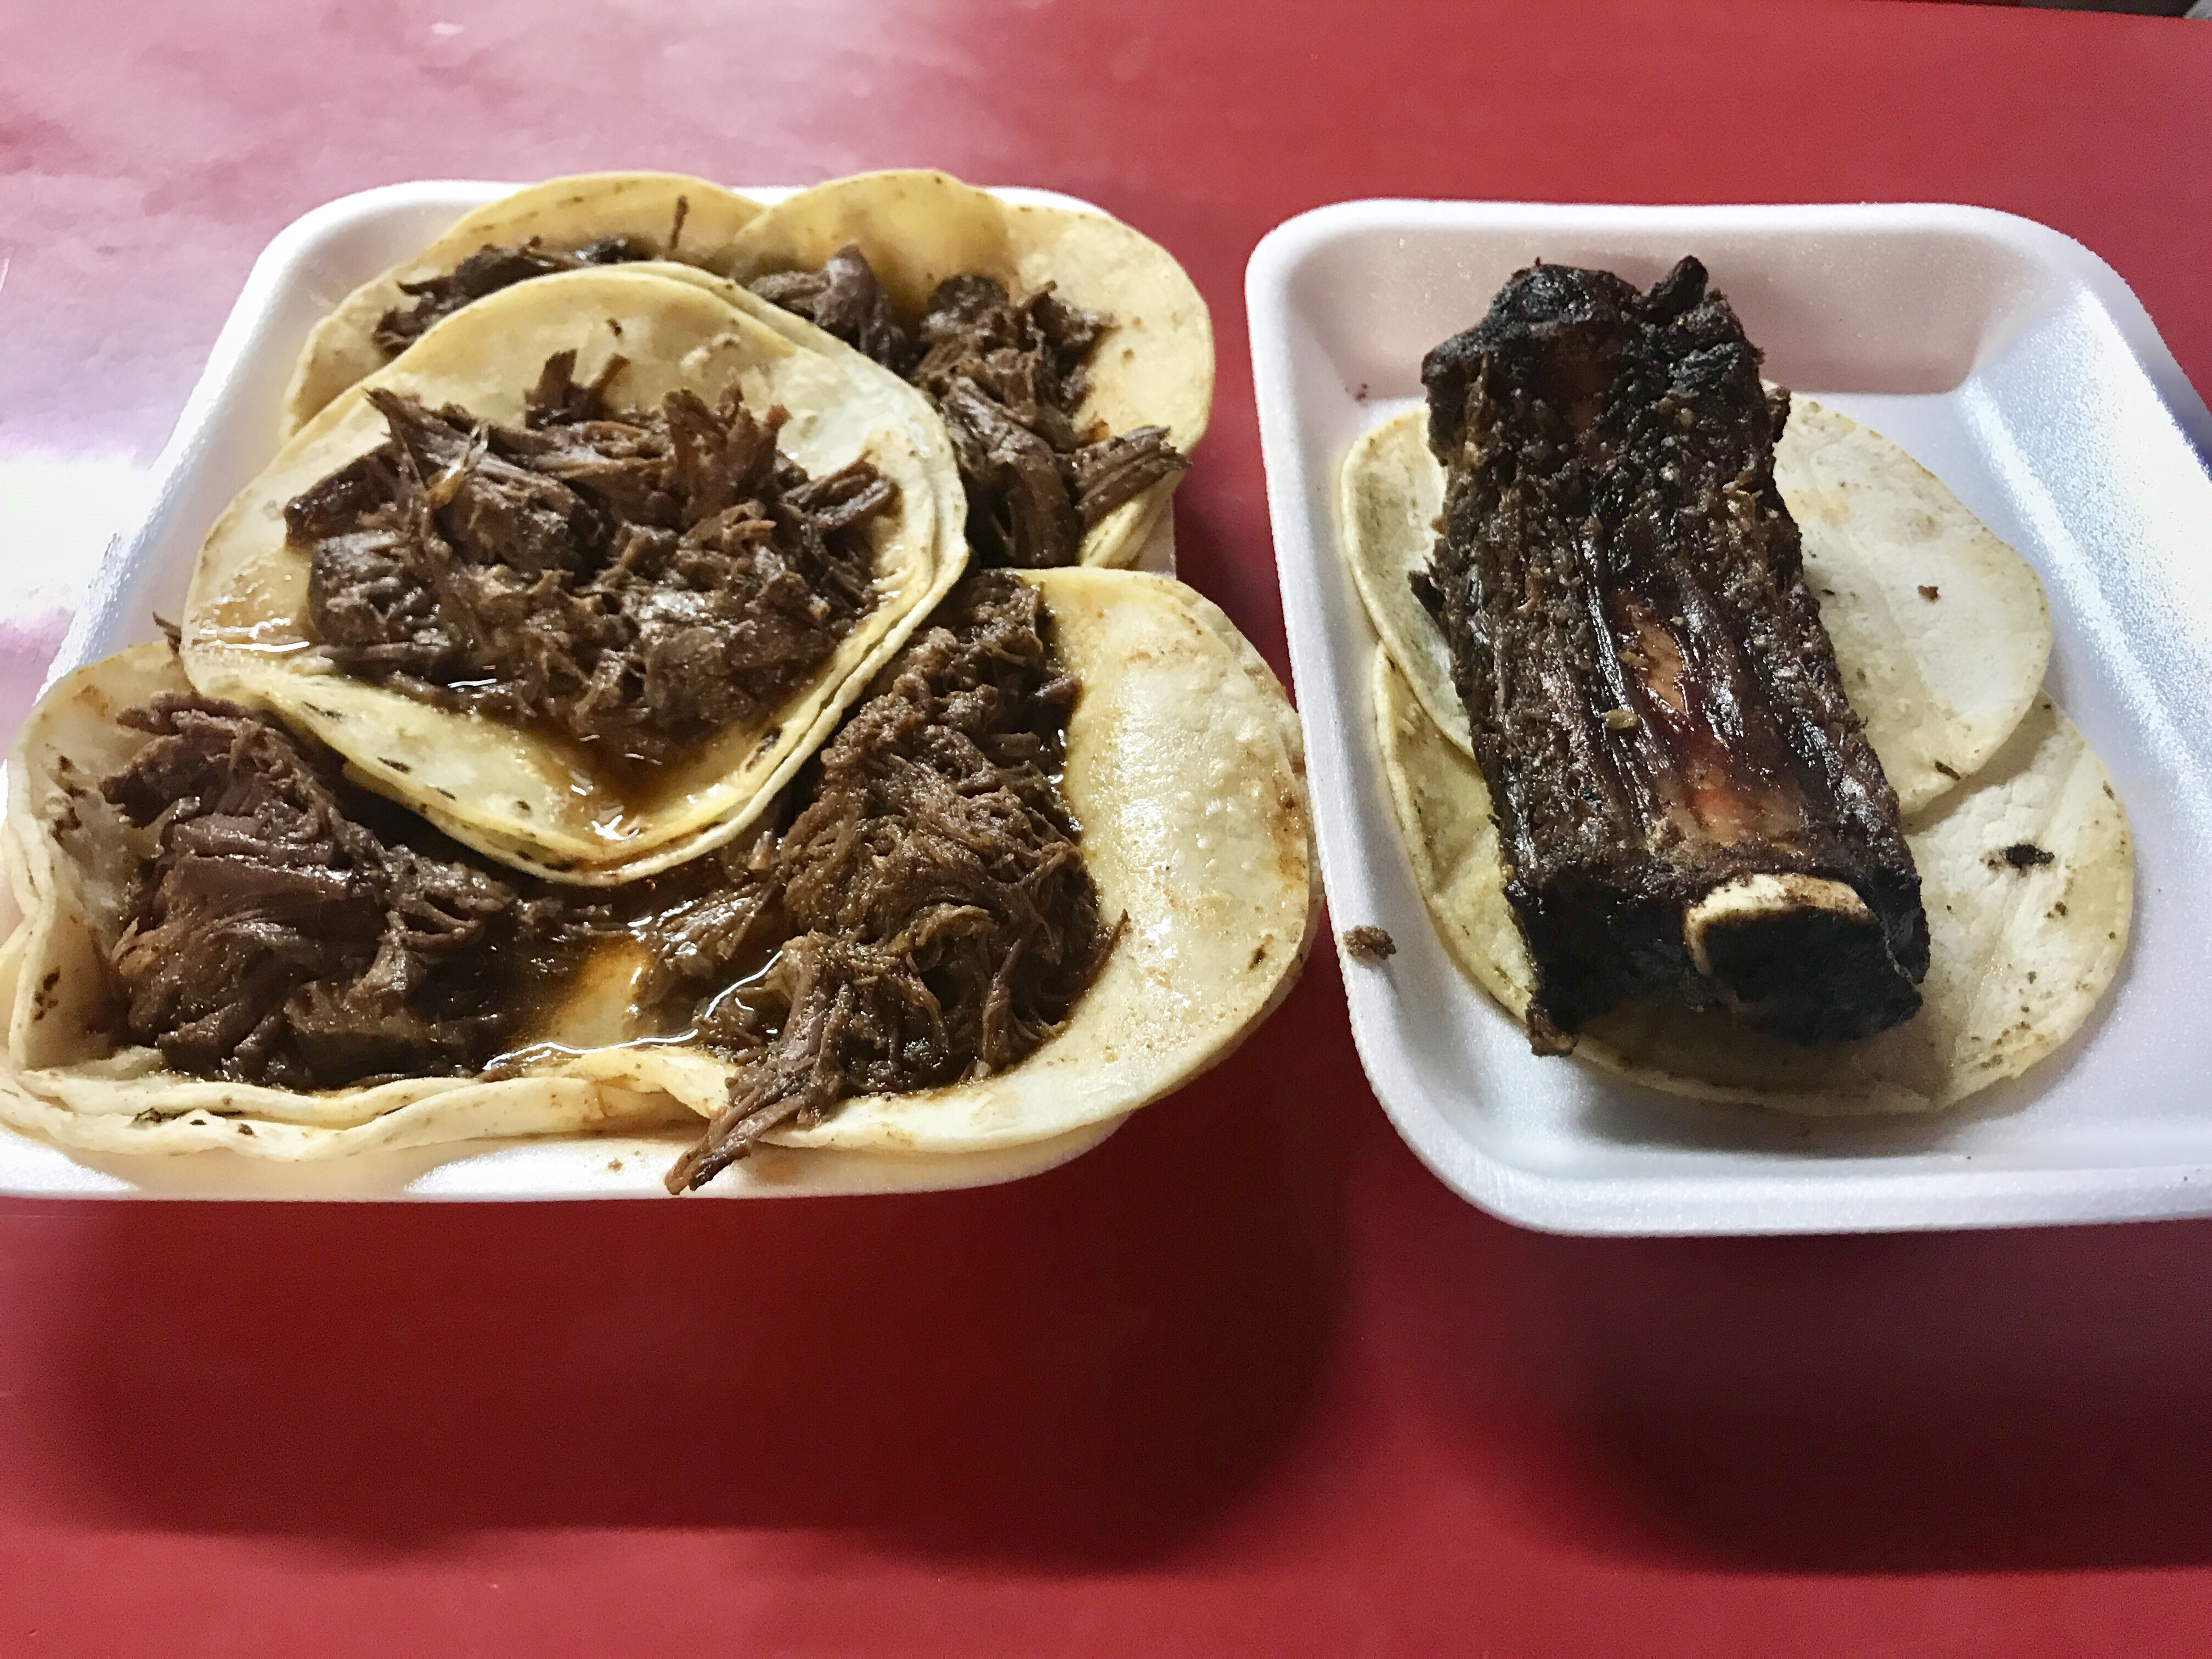 Barbacoa and rib tacos at Los Tacos Apson in Tucson, Arizona